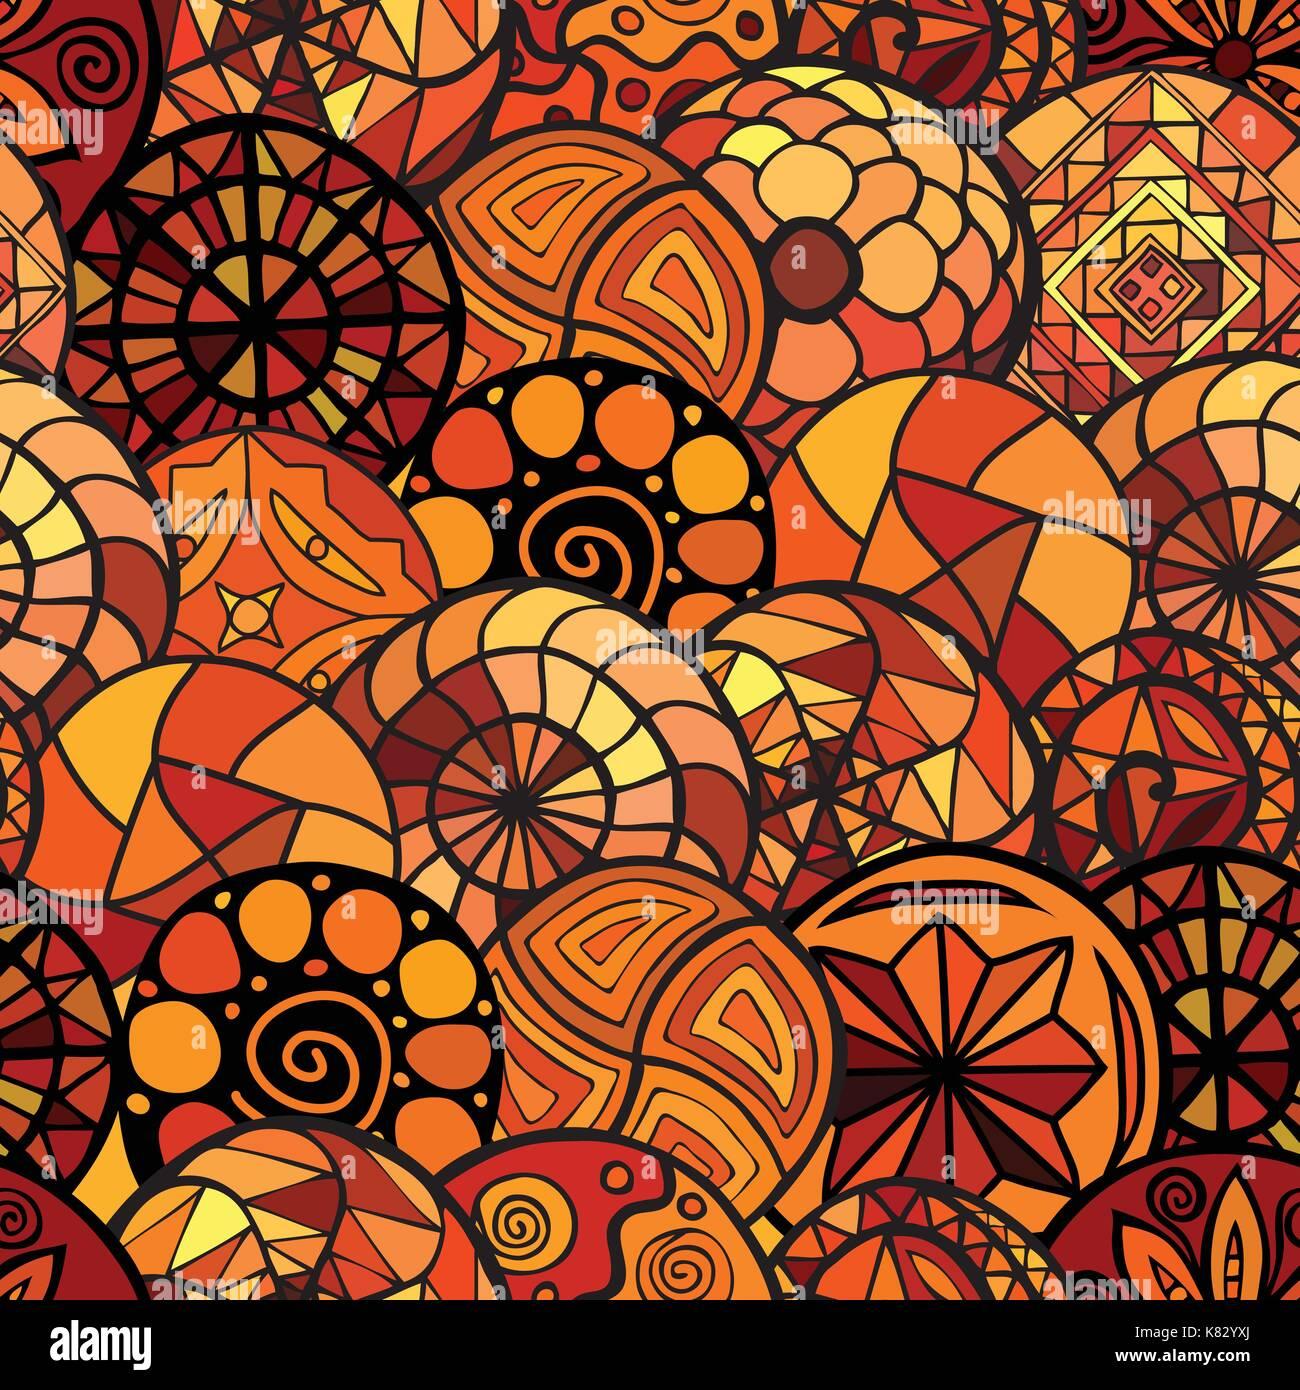 Batik Pattern Stock Photos & Batik Pattern Stock Images